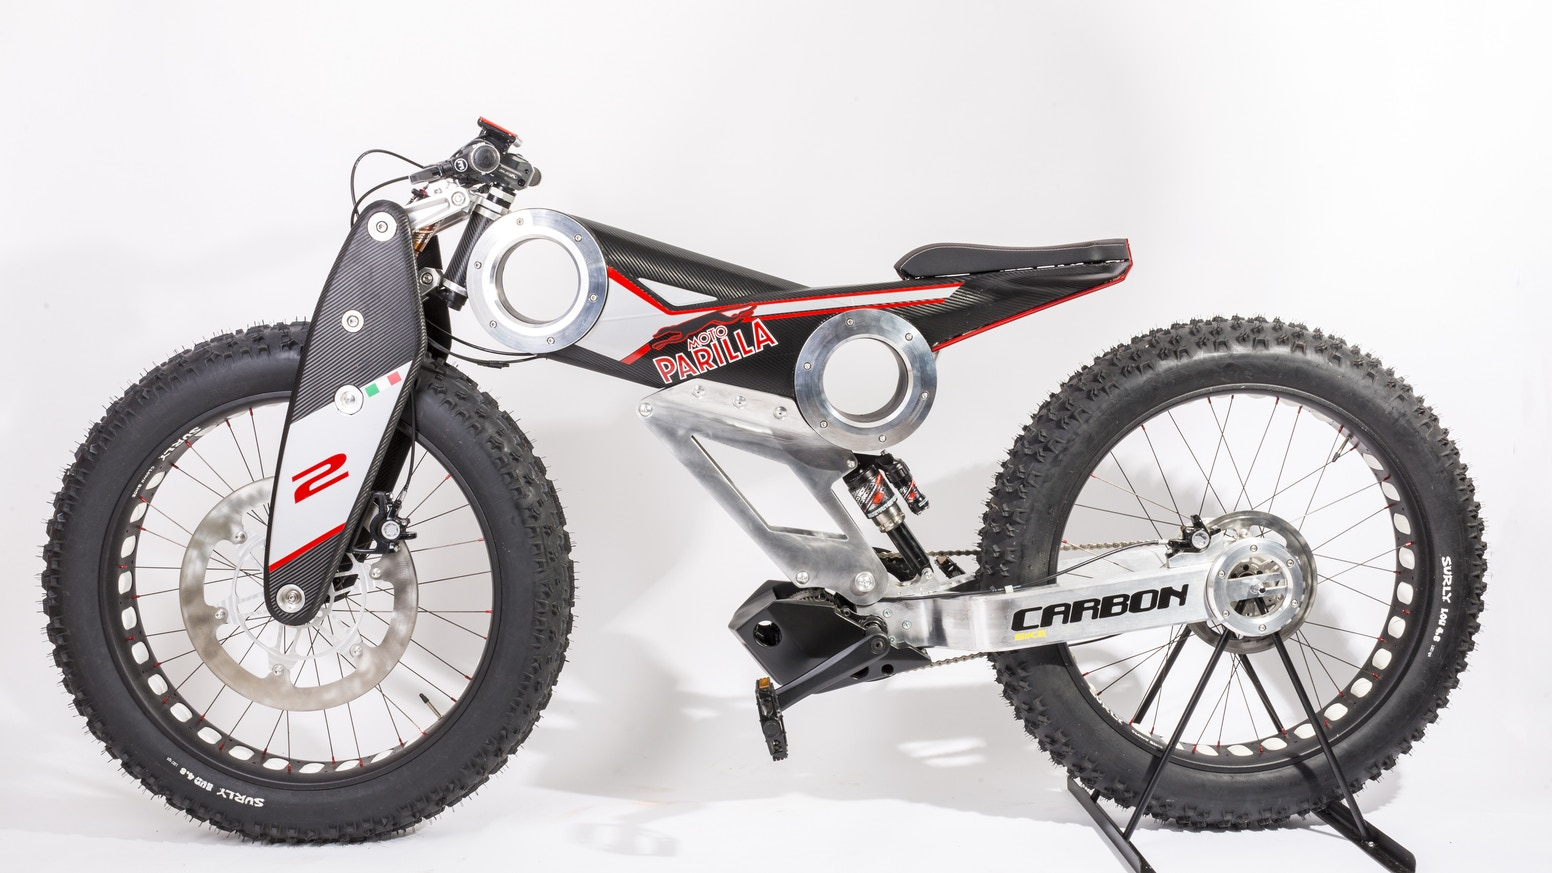 New Carbon SUV e-bike by Moto Parilla — Kickstarter